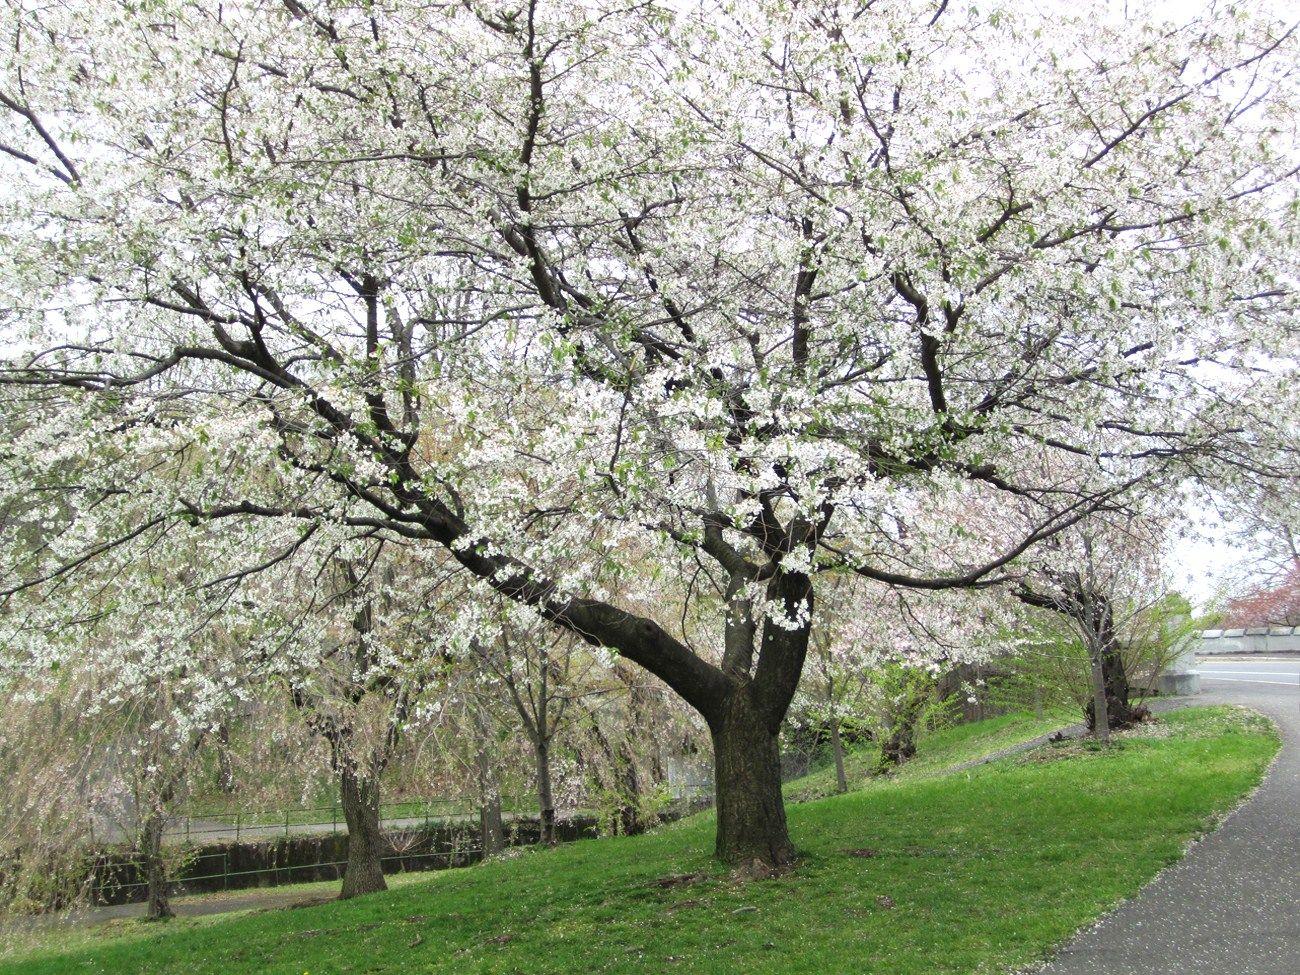 White Blossom Tree By Path In Cherry Blossom Park Photo By Virginia Varela White Blossom Tree Blossom Trees Tree